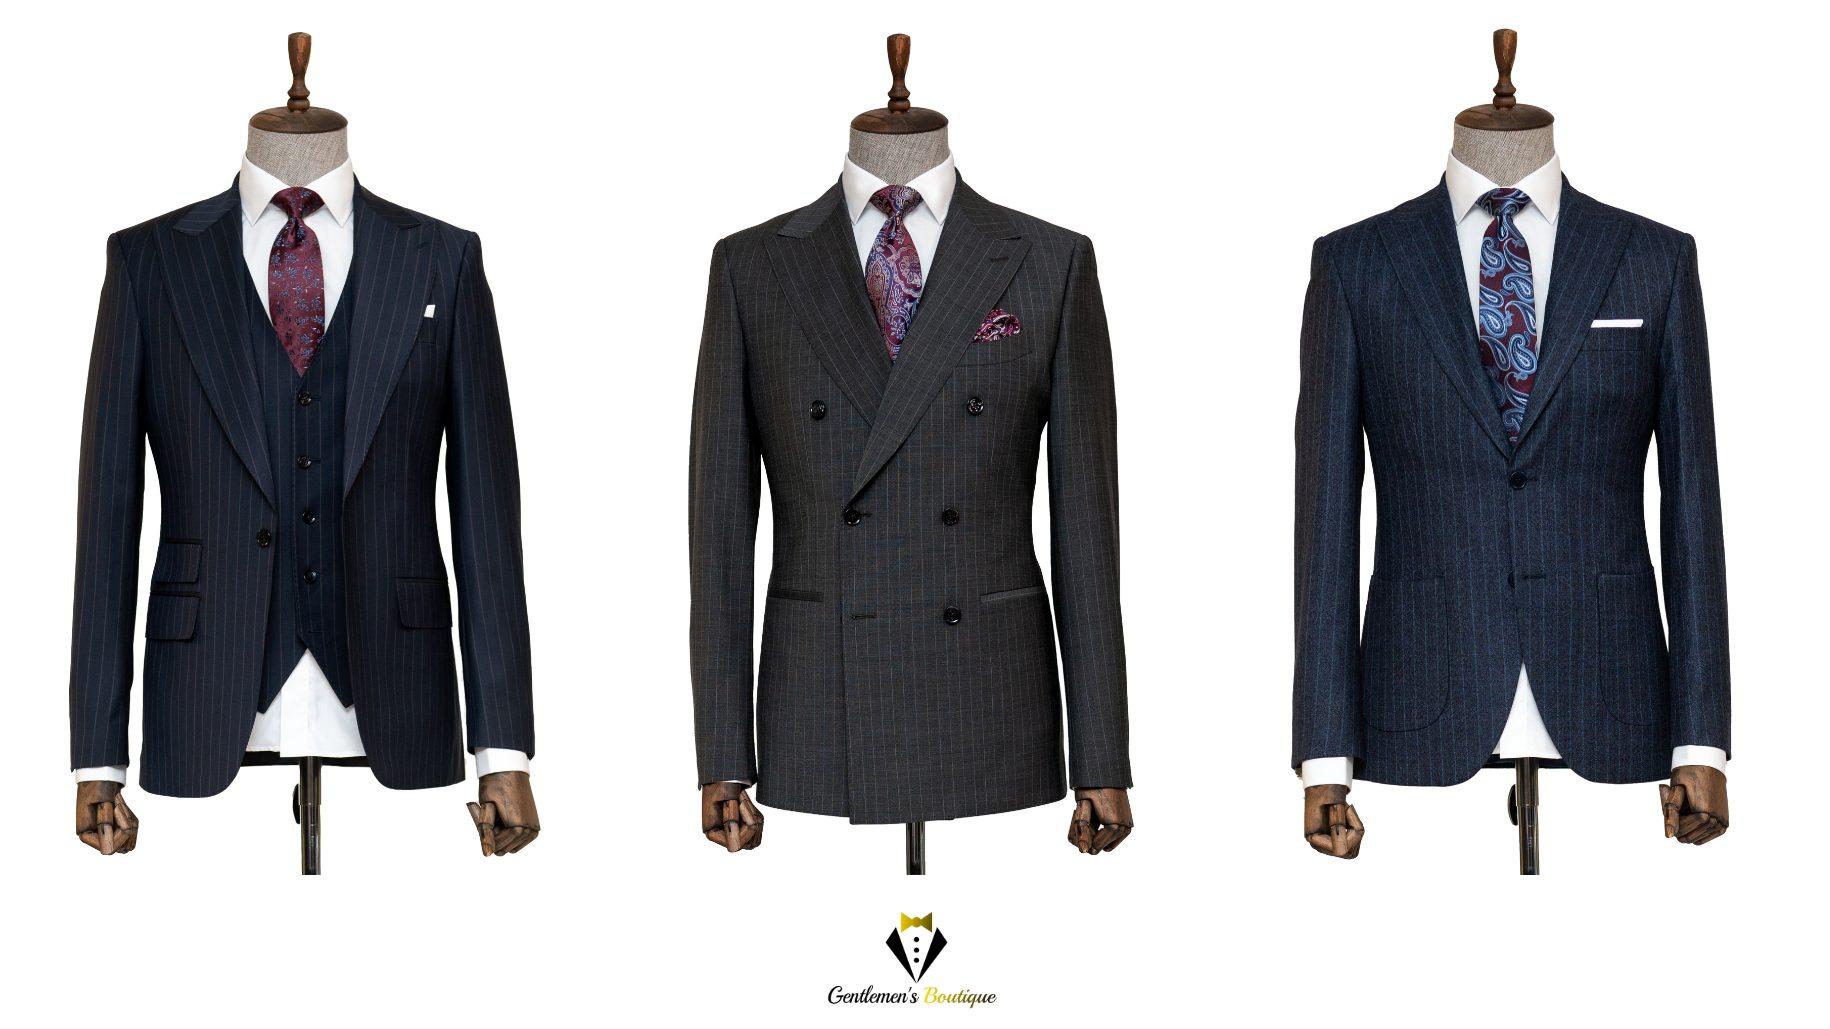 Noua-Colectie-De-Costume-Barbati-ARISTOCRAT-Magazin-Costume-Barbati-Cluj-Napoca-Gentlemens-Boutique-Gold-